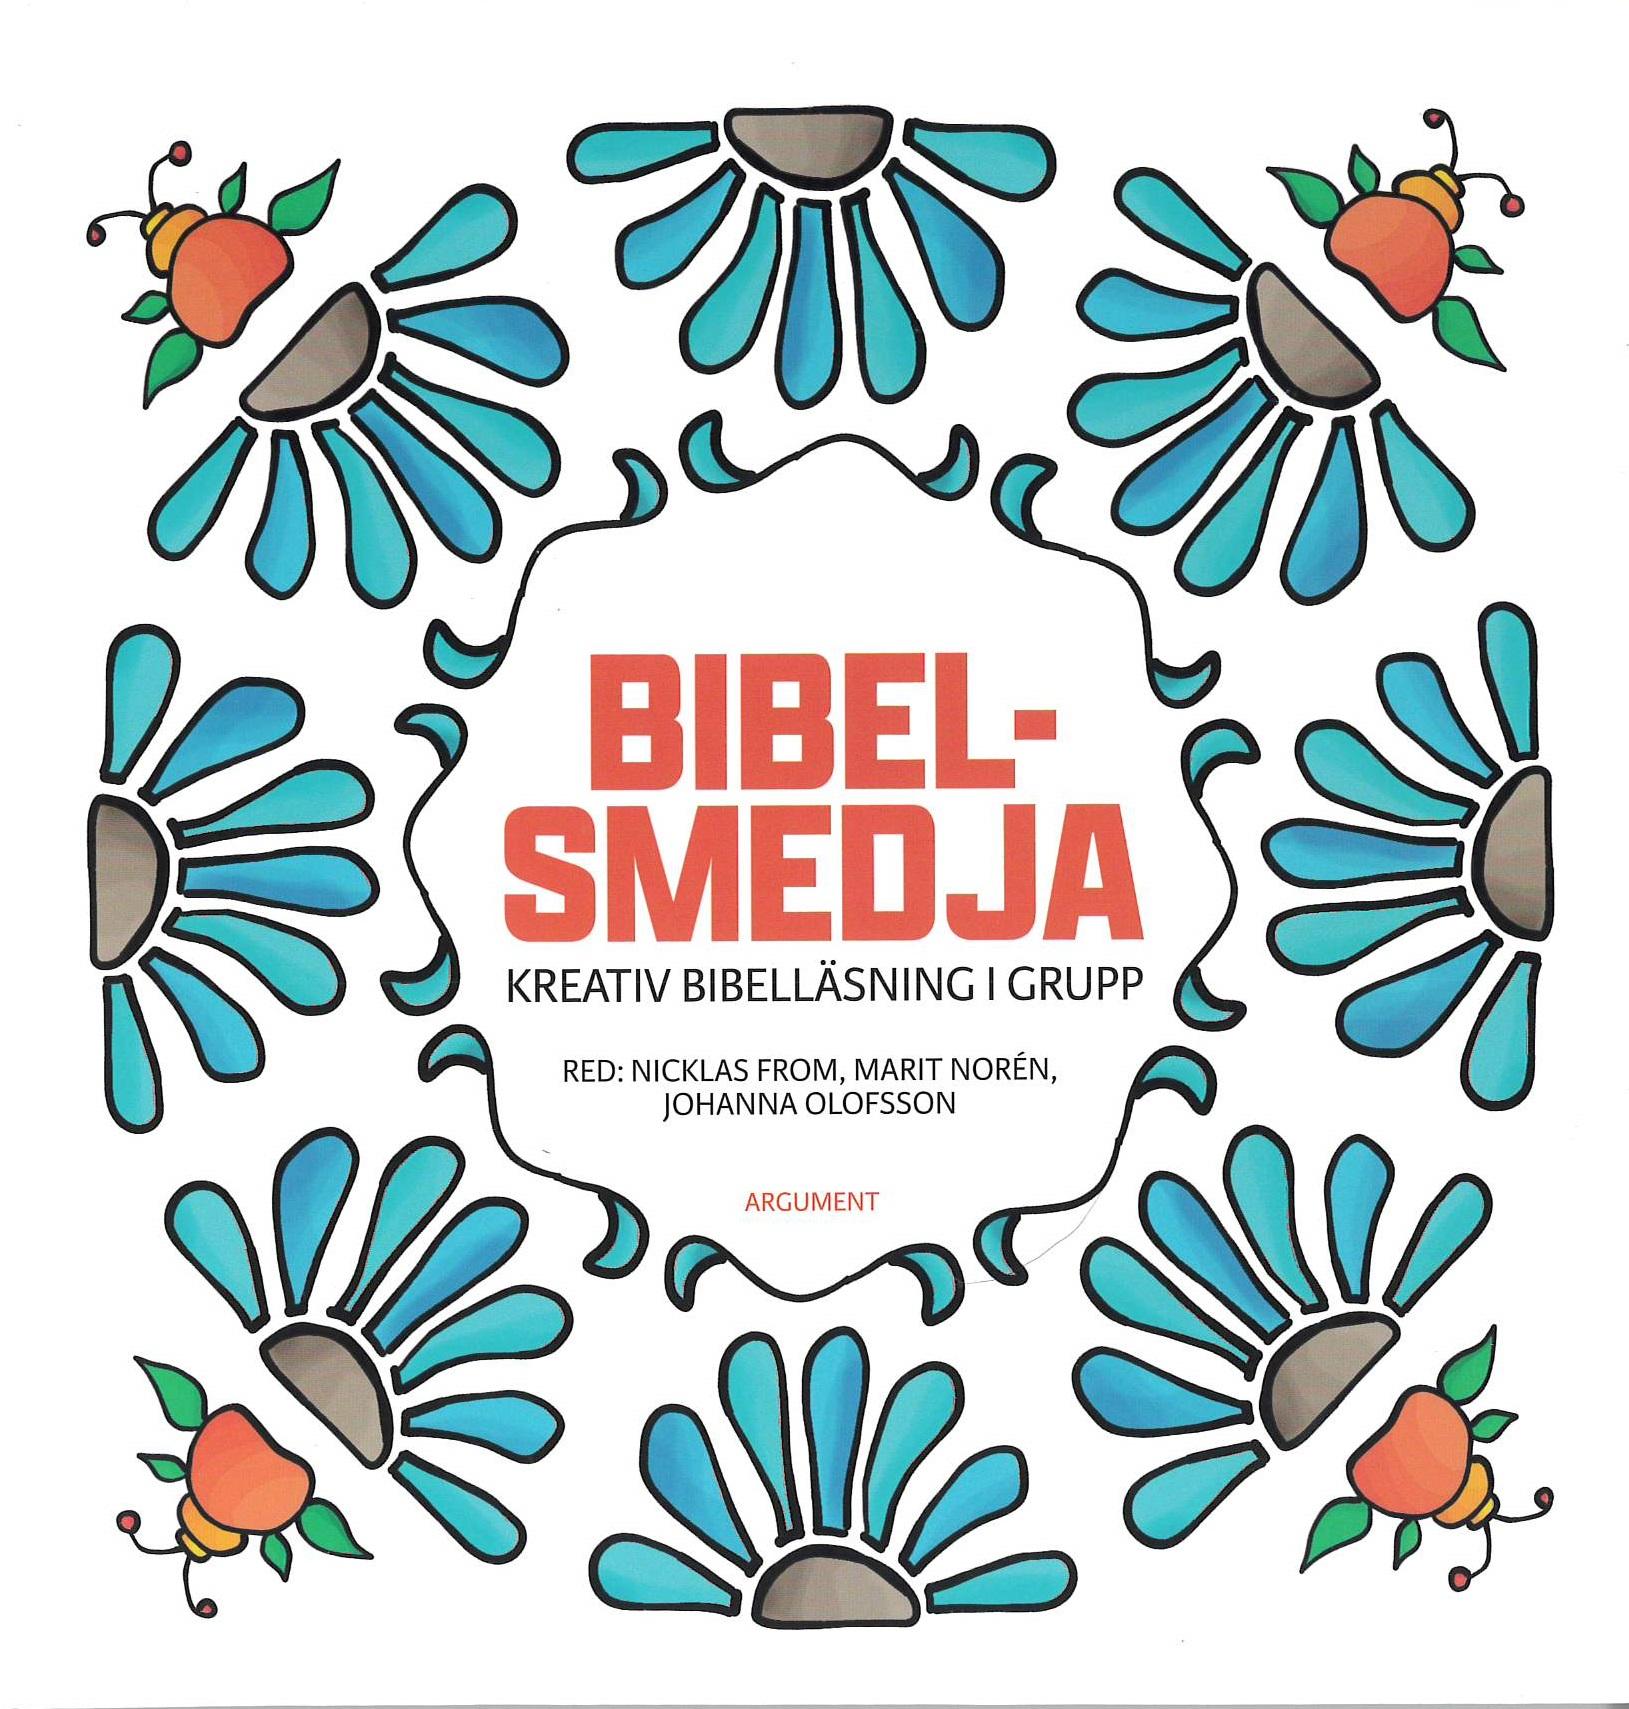 Bibelsmedja artikelnummer 2590 via bibelbutiken.se